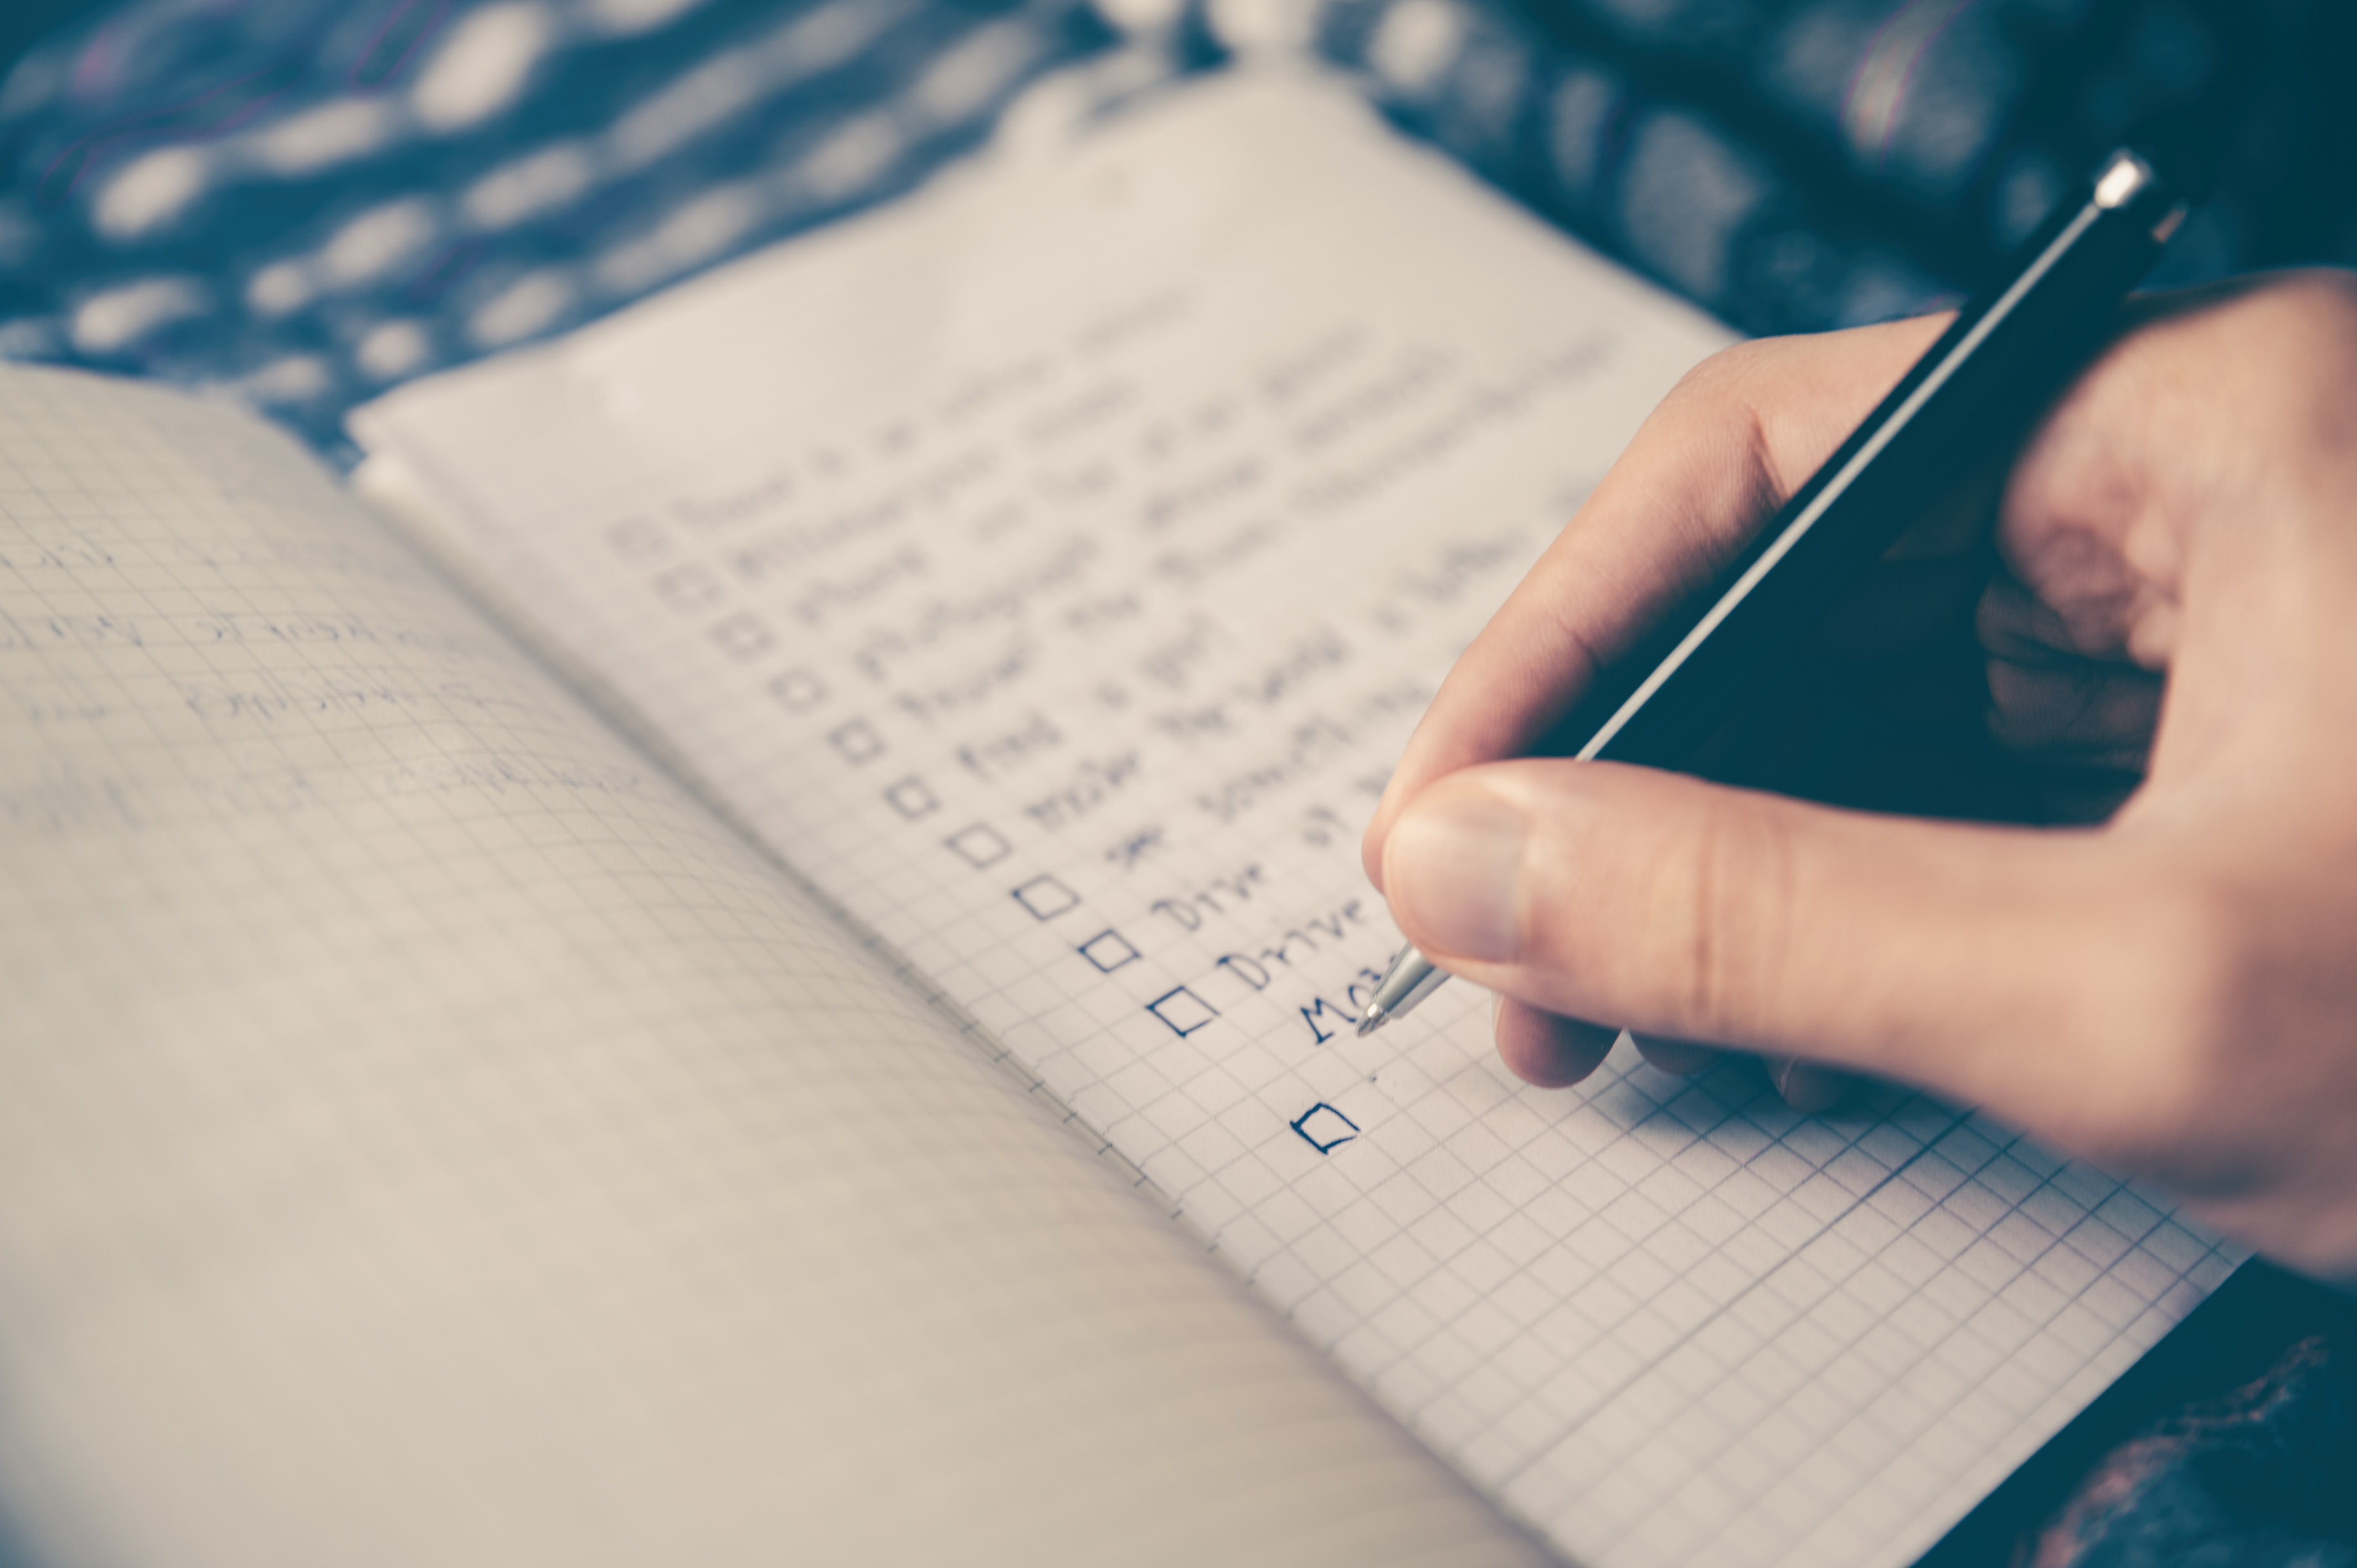 چک لیست لانچ - Launch Checklist